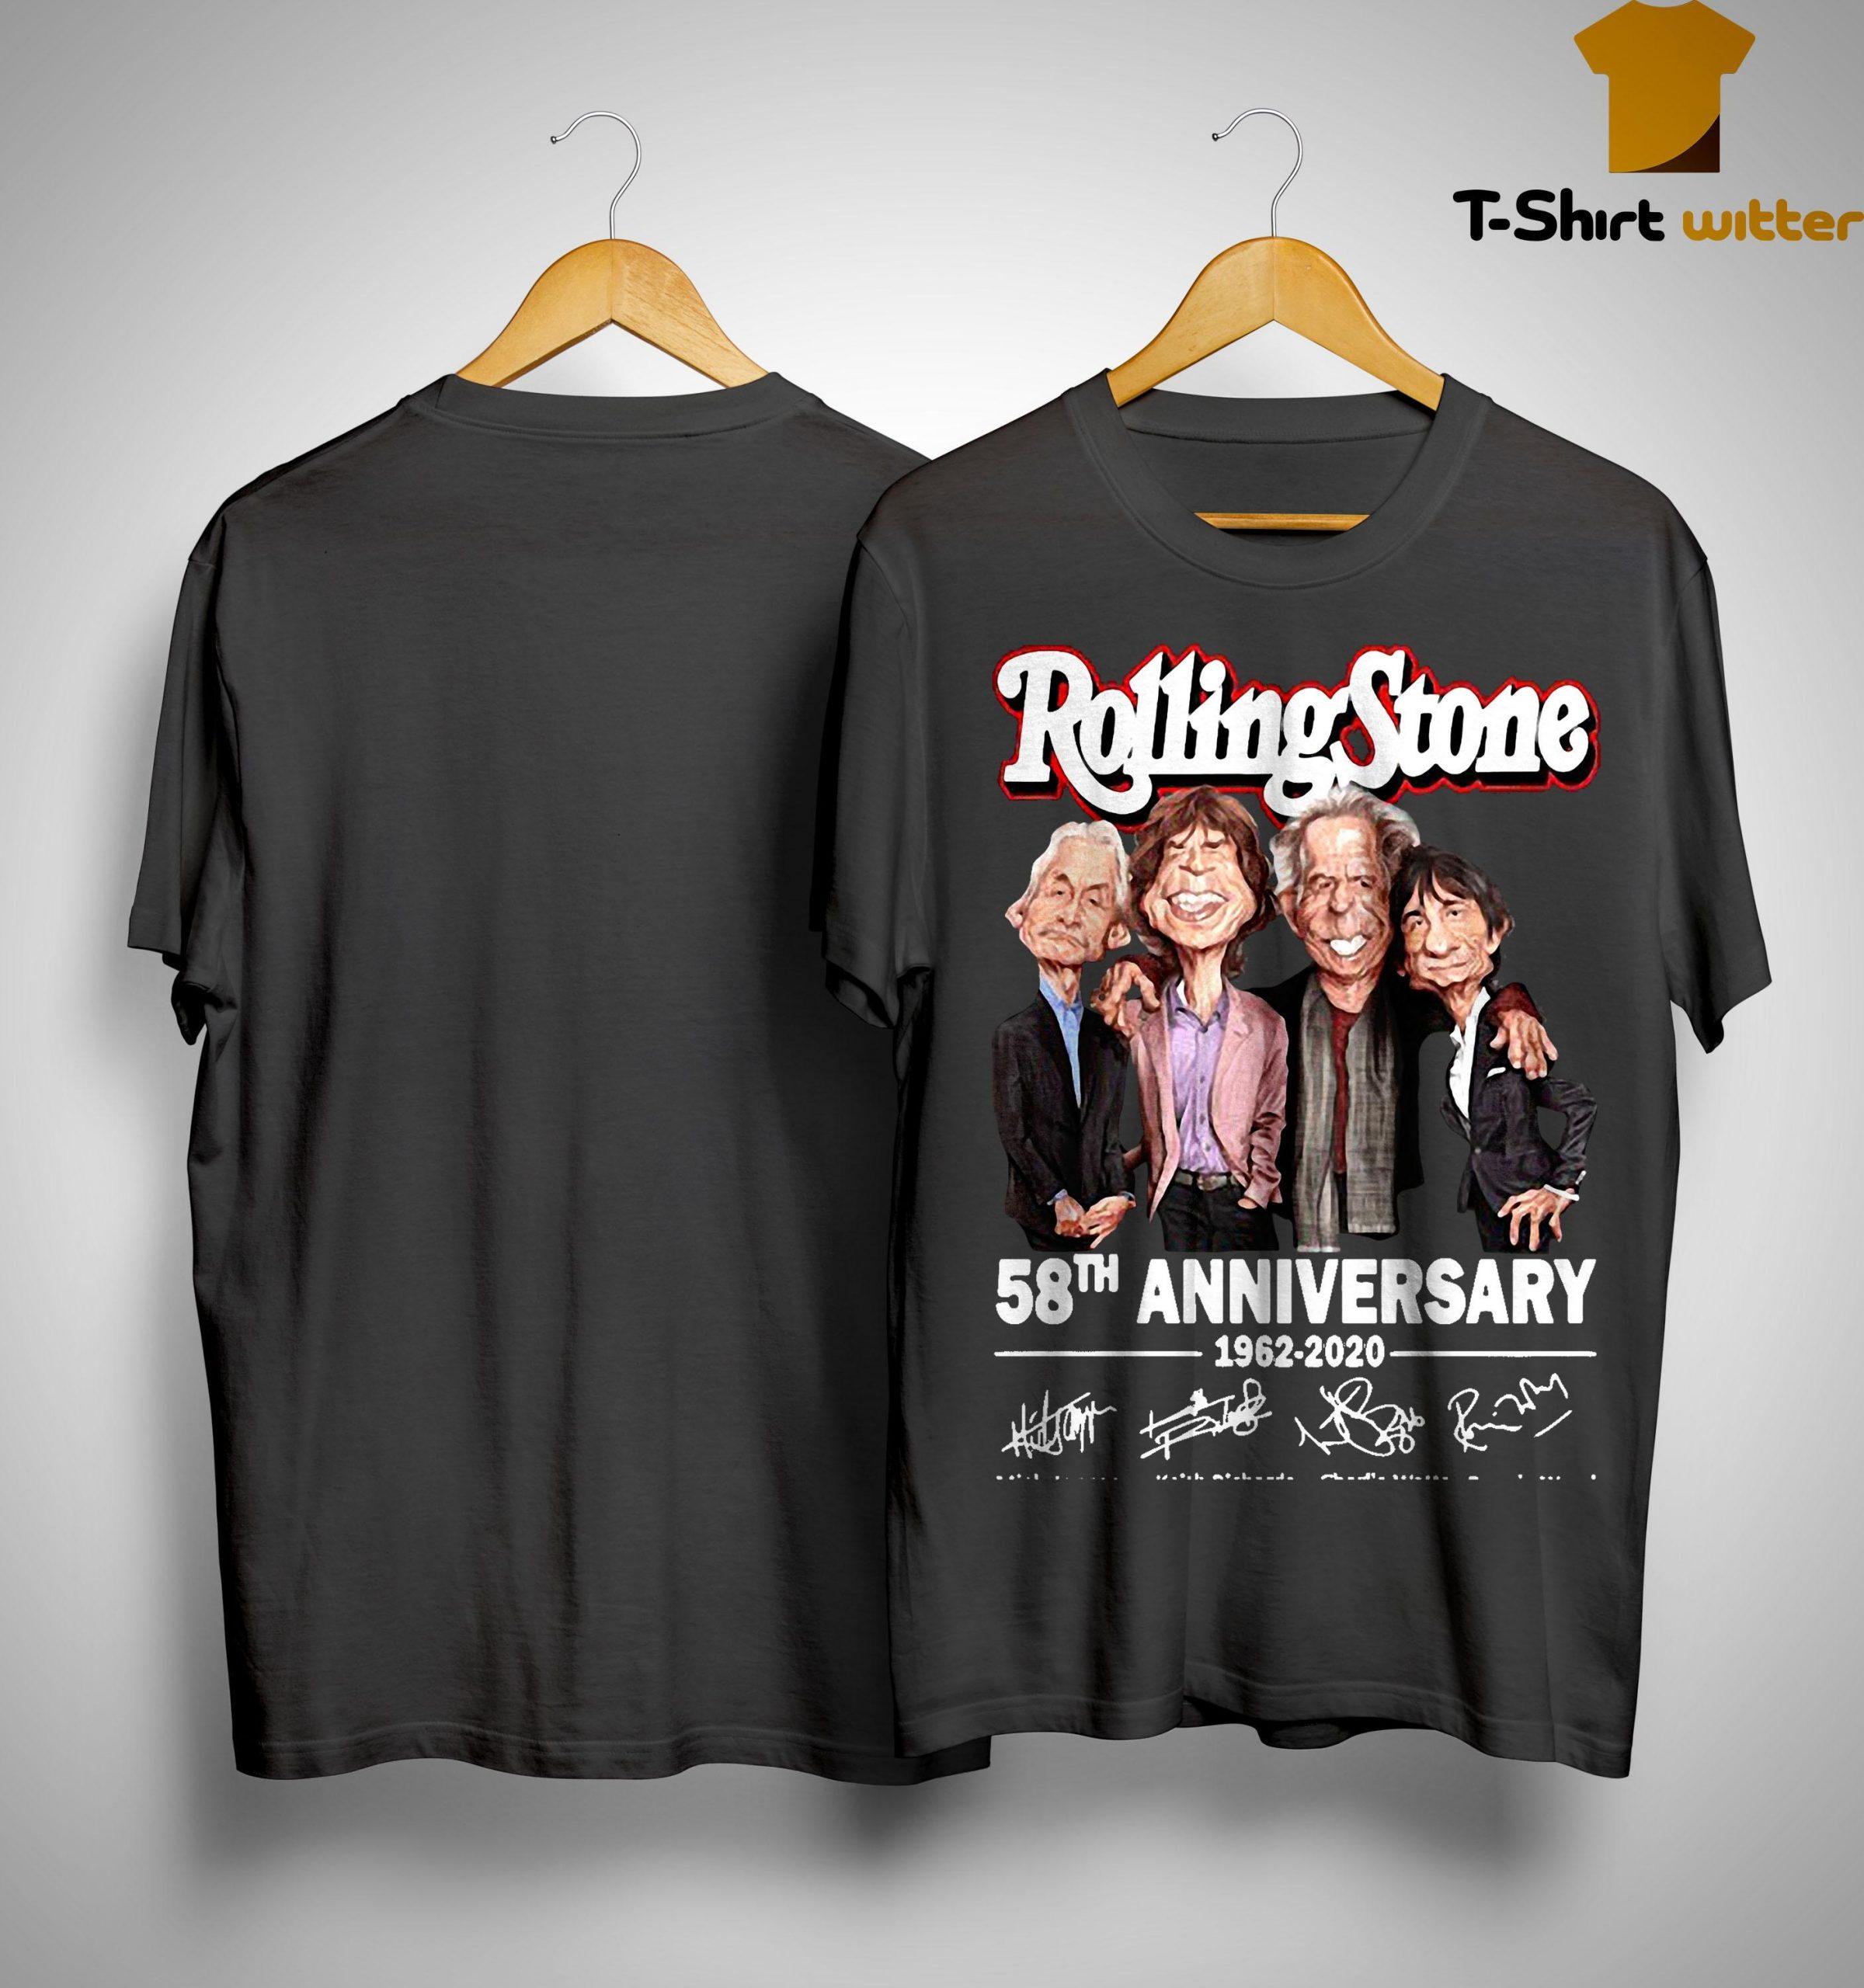 Rolling Stone 58th Anniversary 1962 2020 Shirt